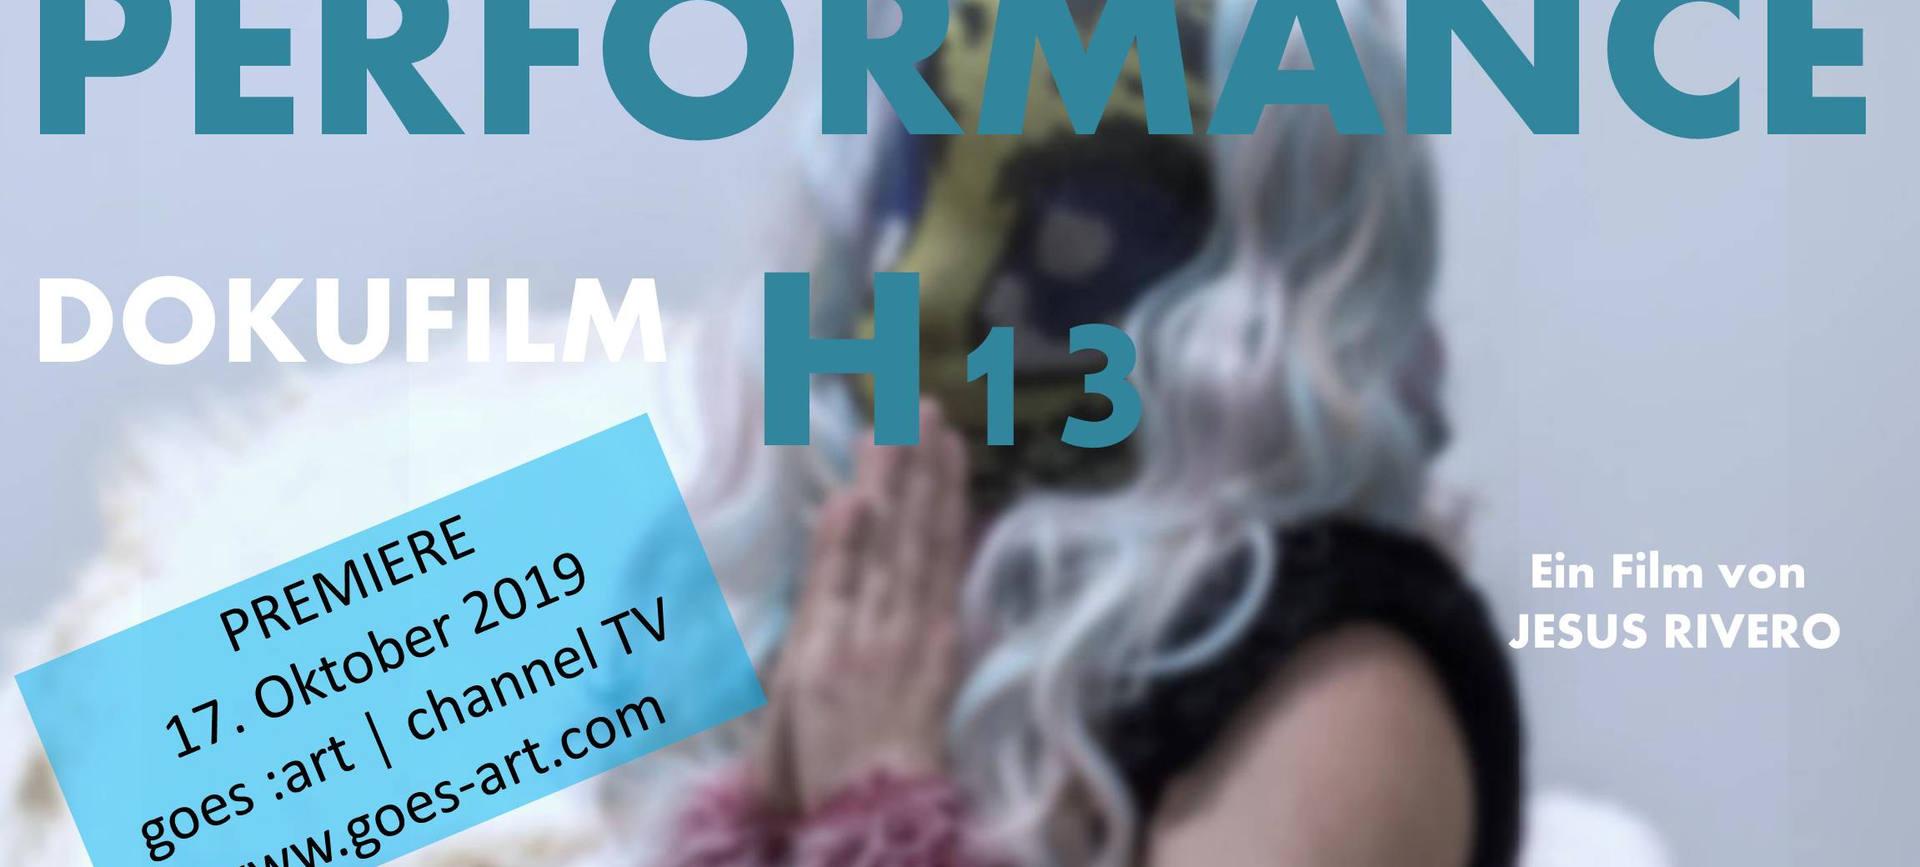 PERFORMANCE H13